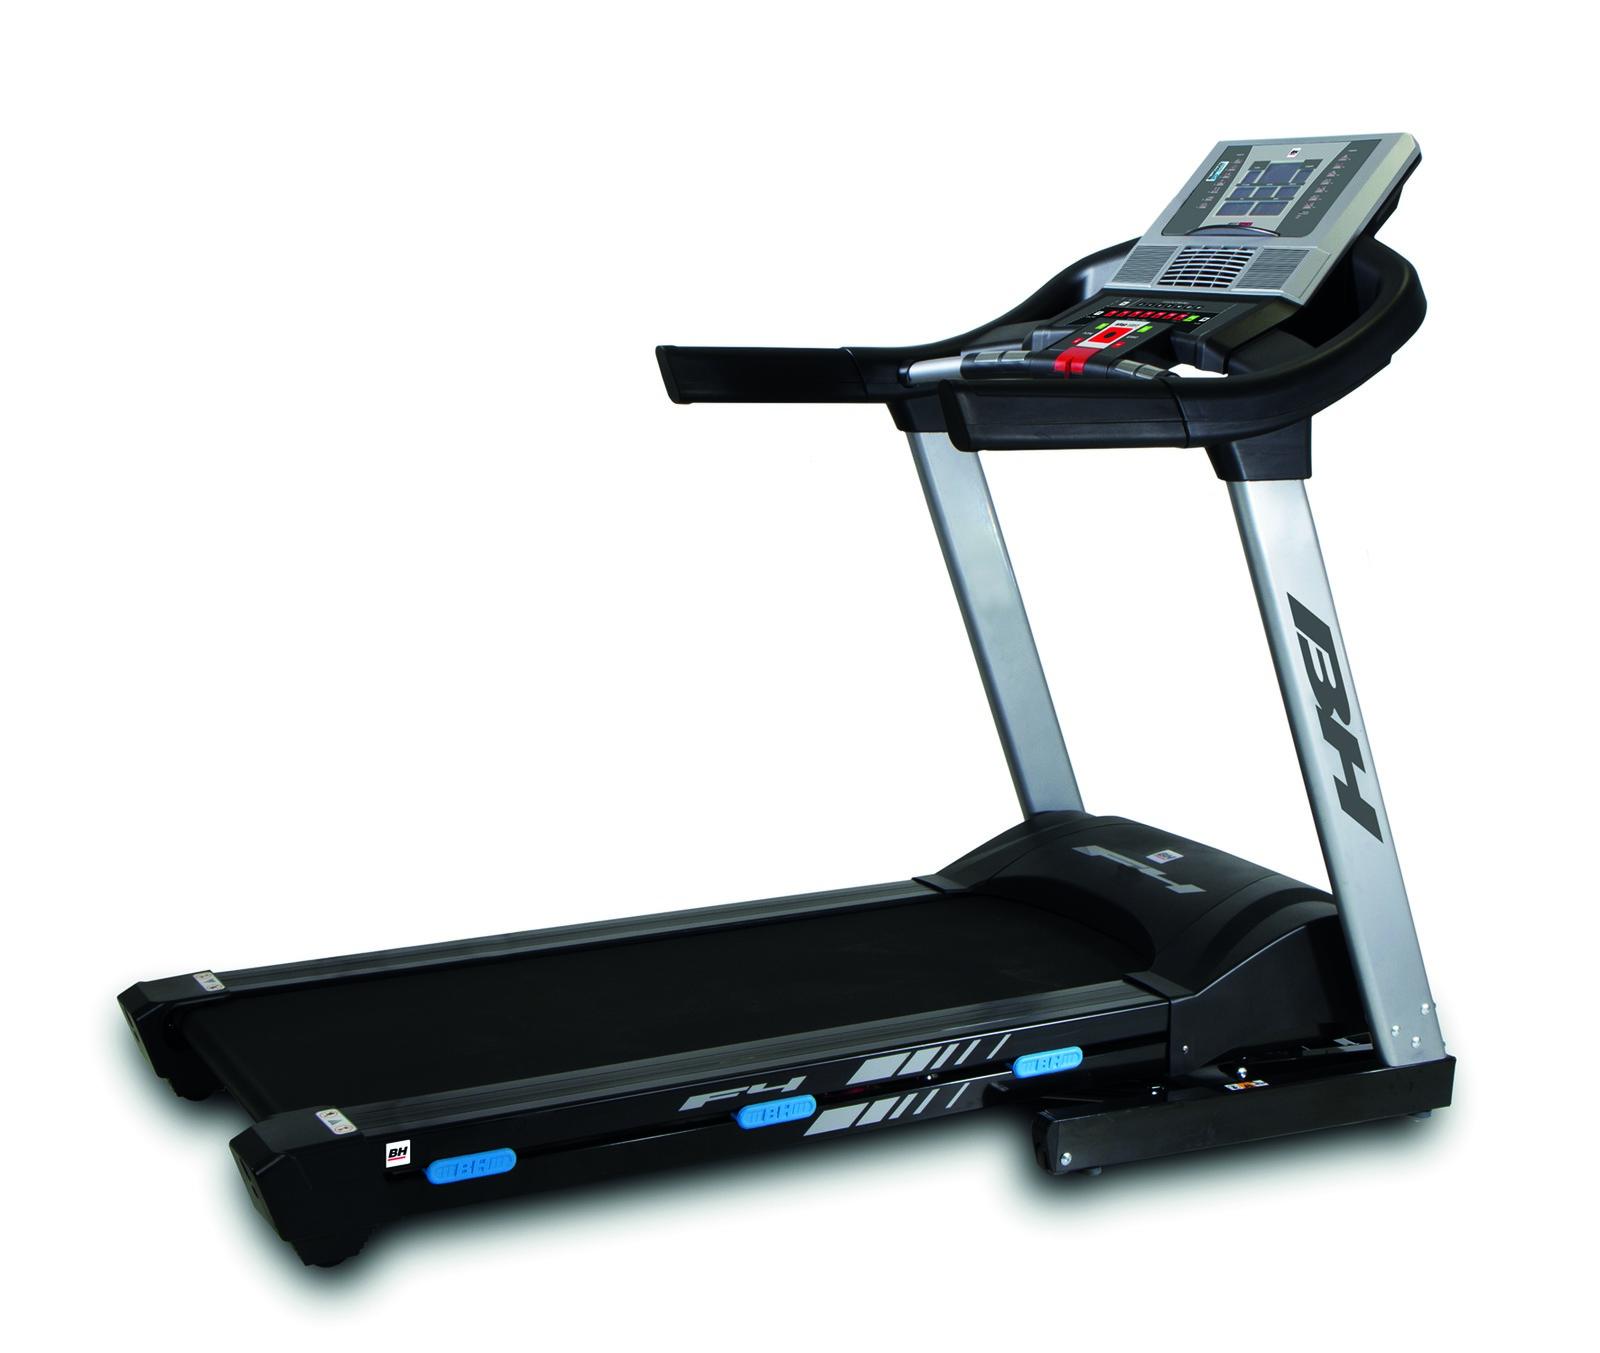 BH I.F4 Folding Treadmill with Bluetooth